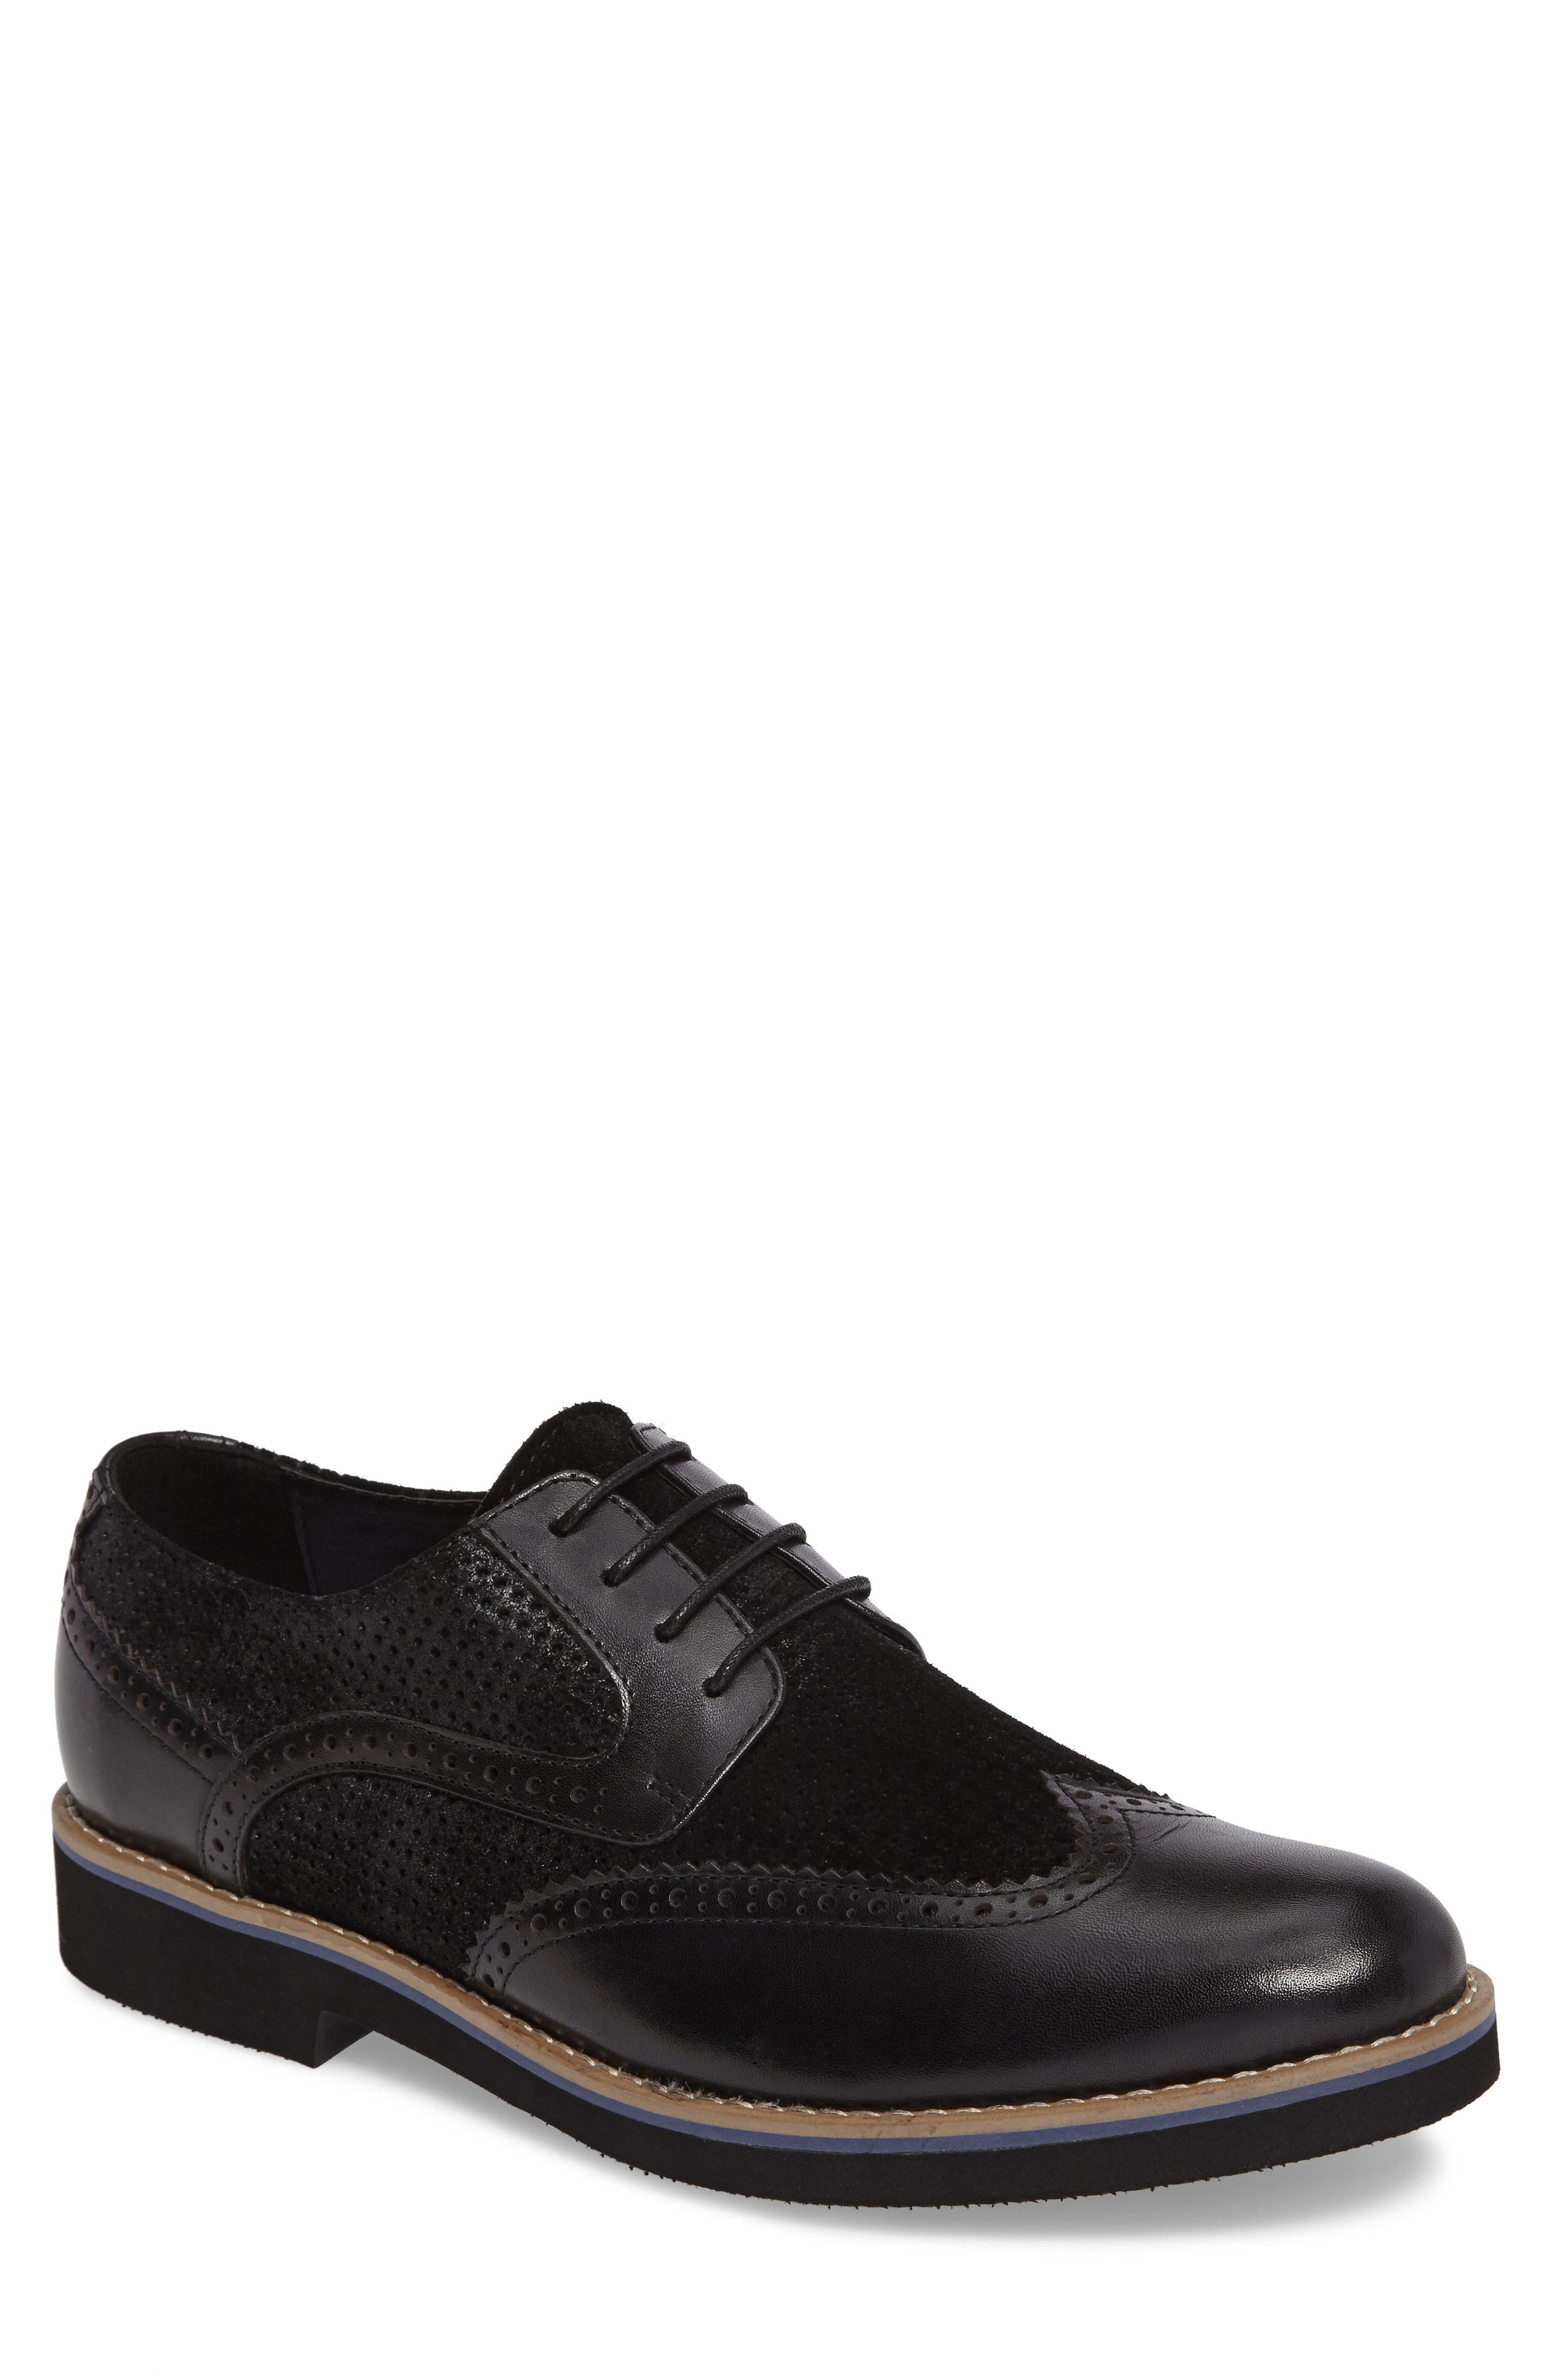 Maritime Spectator Shoe,                         Main,                         color, Black Leather